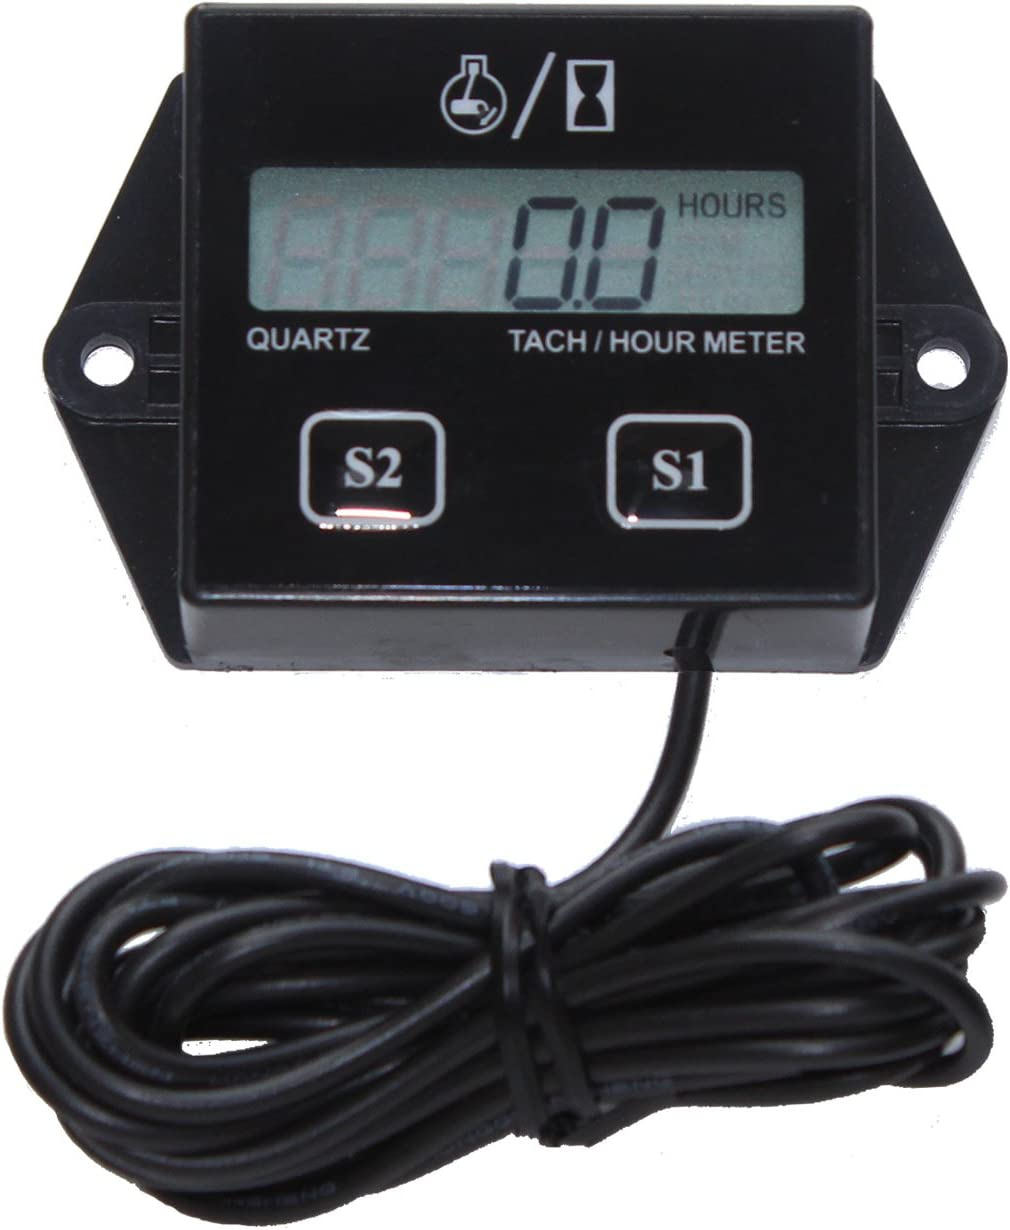 6 Volt Tachometer Positive Ground Wiring Schema Diagrams Diagram For Generator Simple Regulator Rectifier